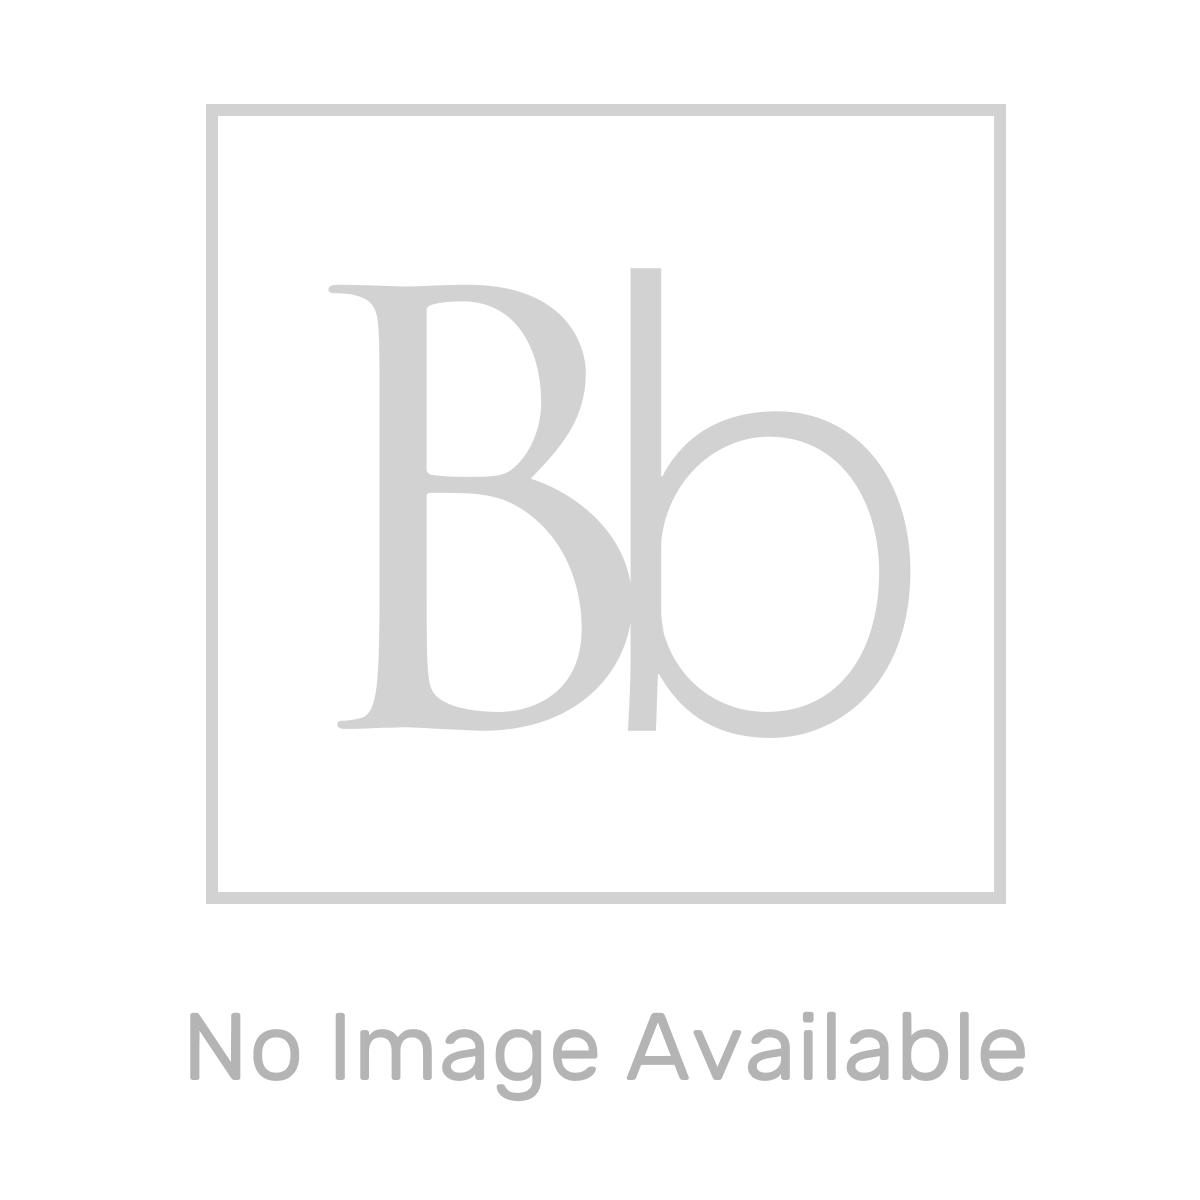 RAK Black Square Ultra Slim Shower Head 250mm Measurements